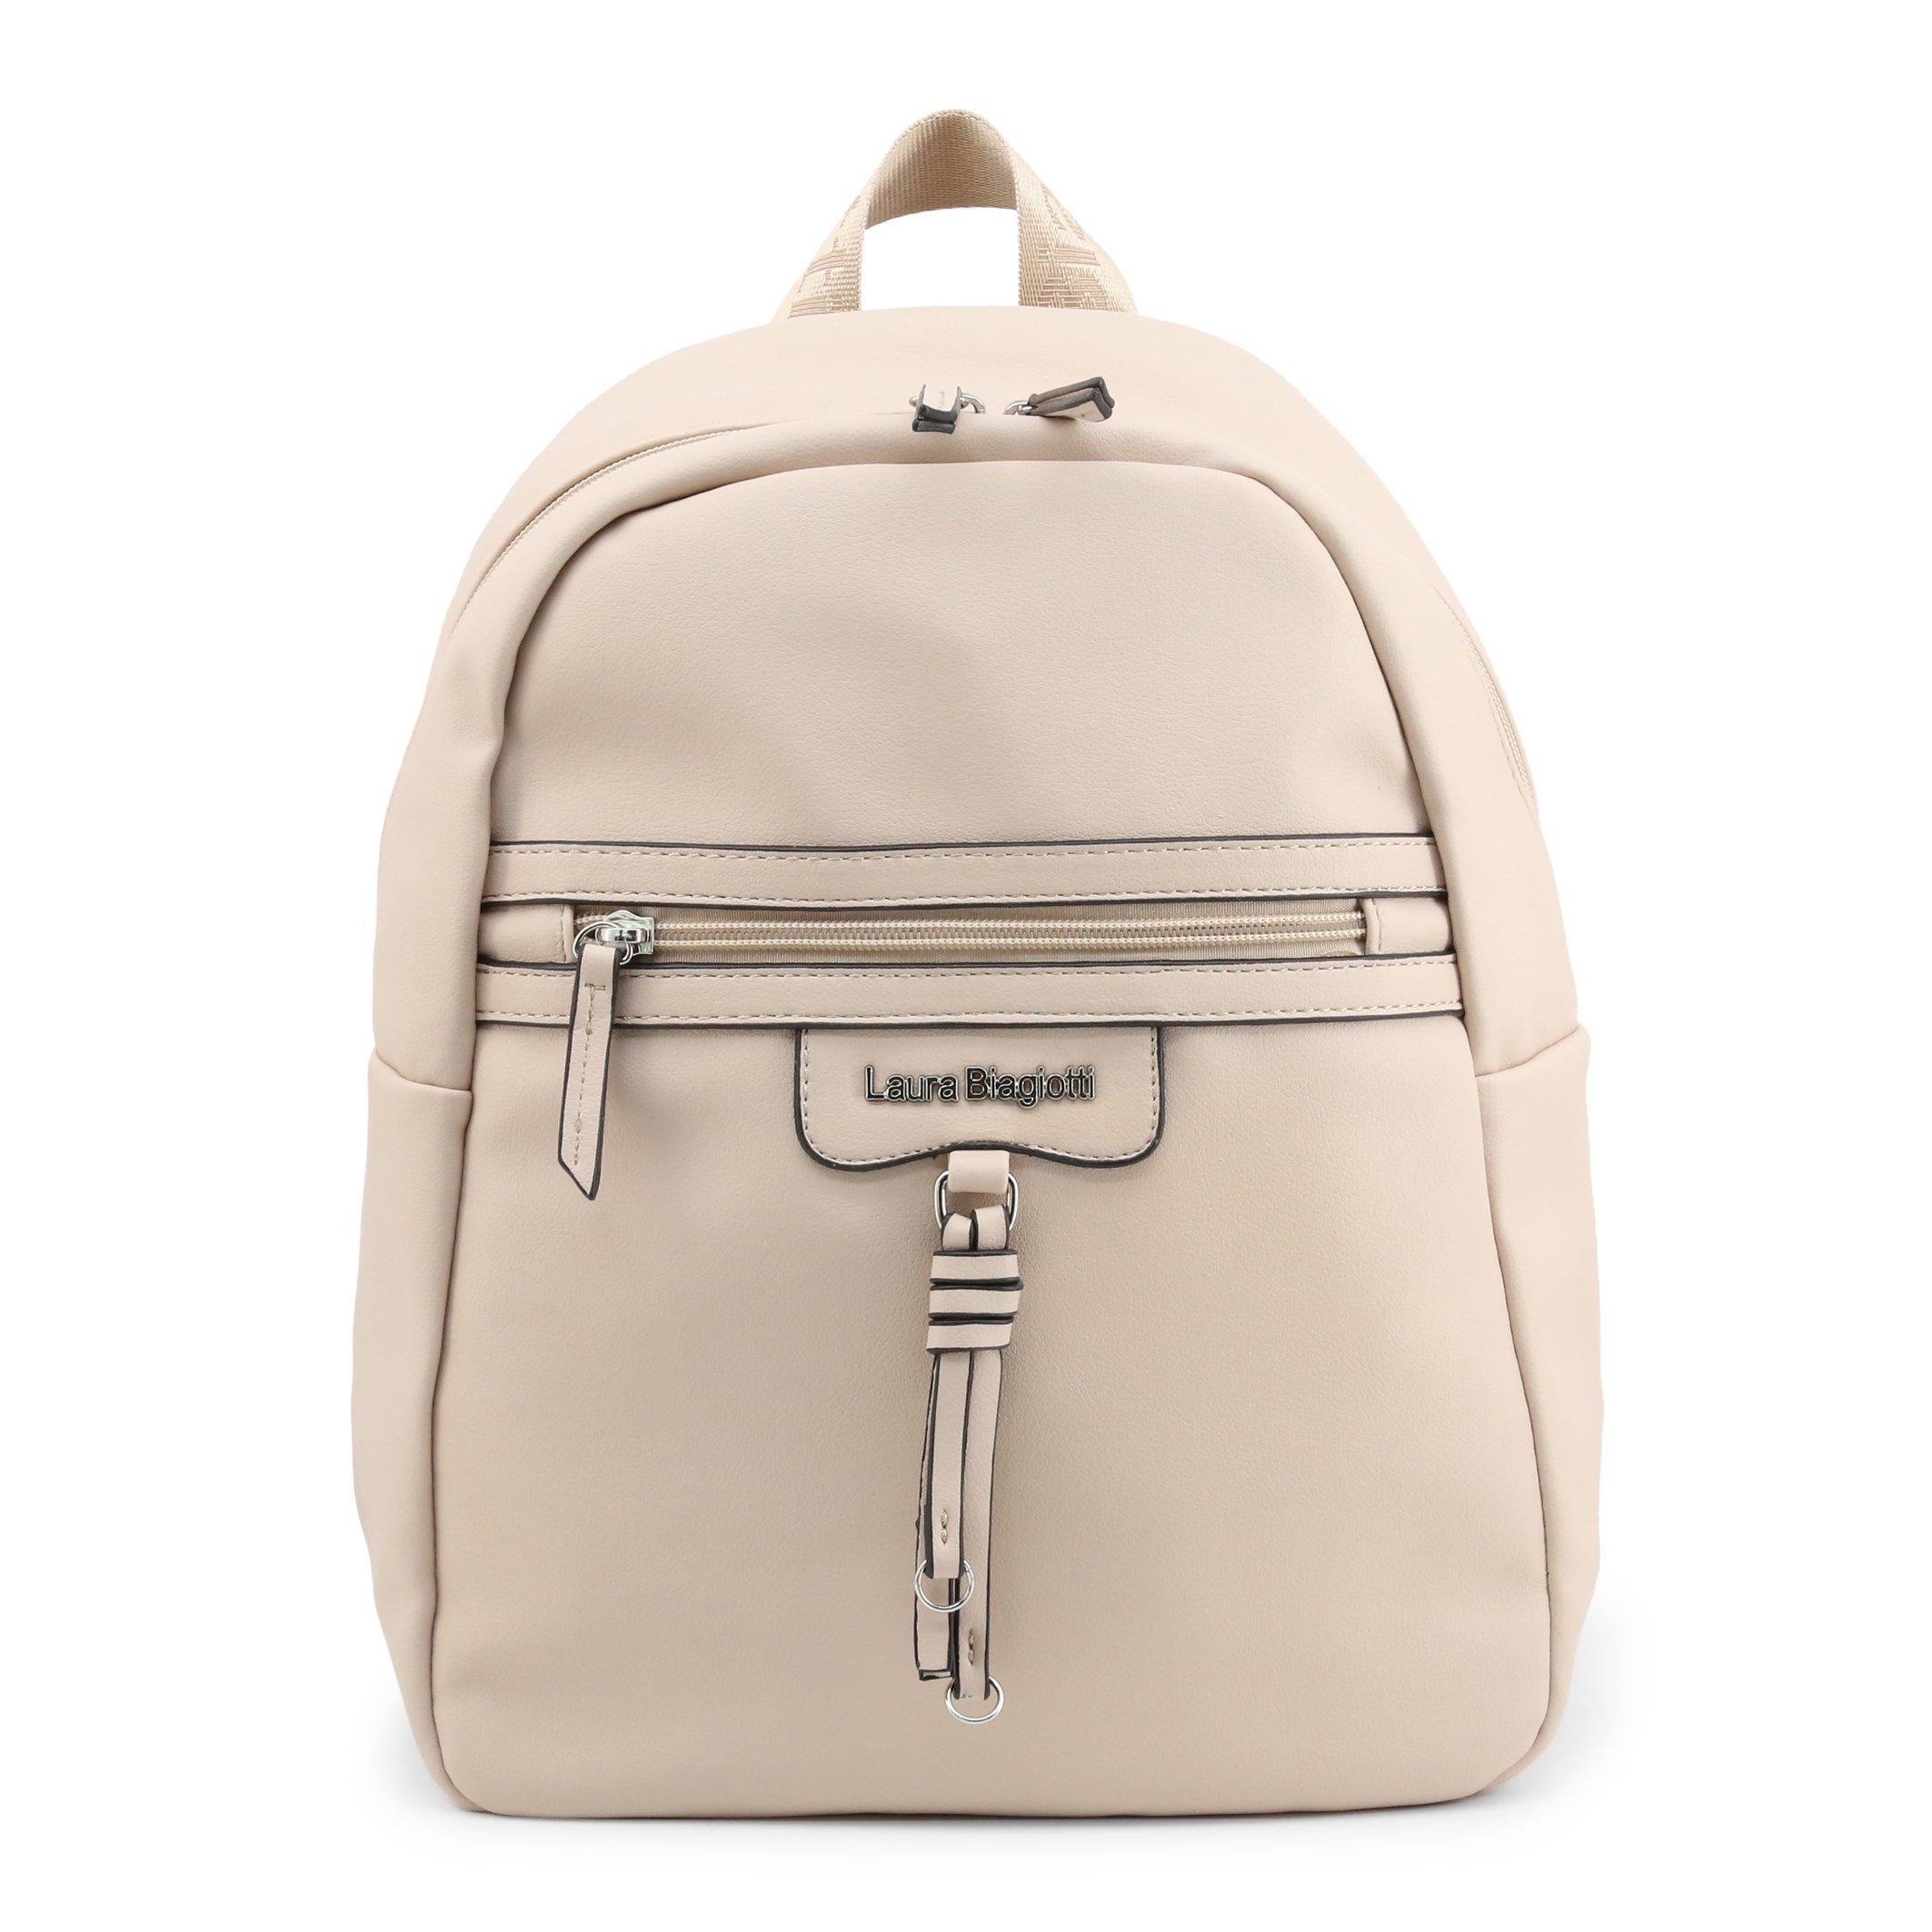 Laura Biagiotti Women's Backpack White Ramsey_103-4 - brown NOSIZE